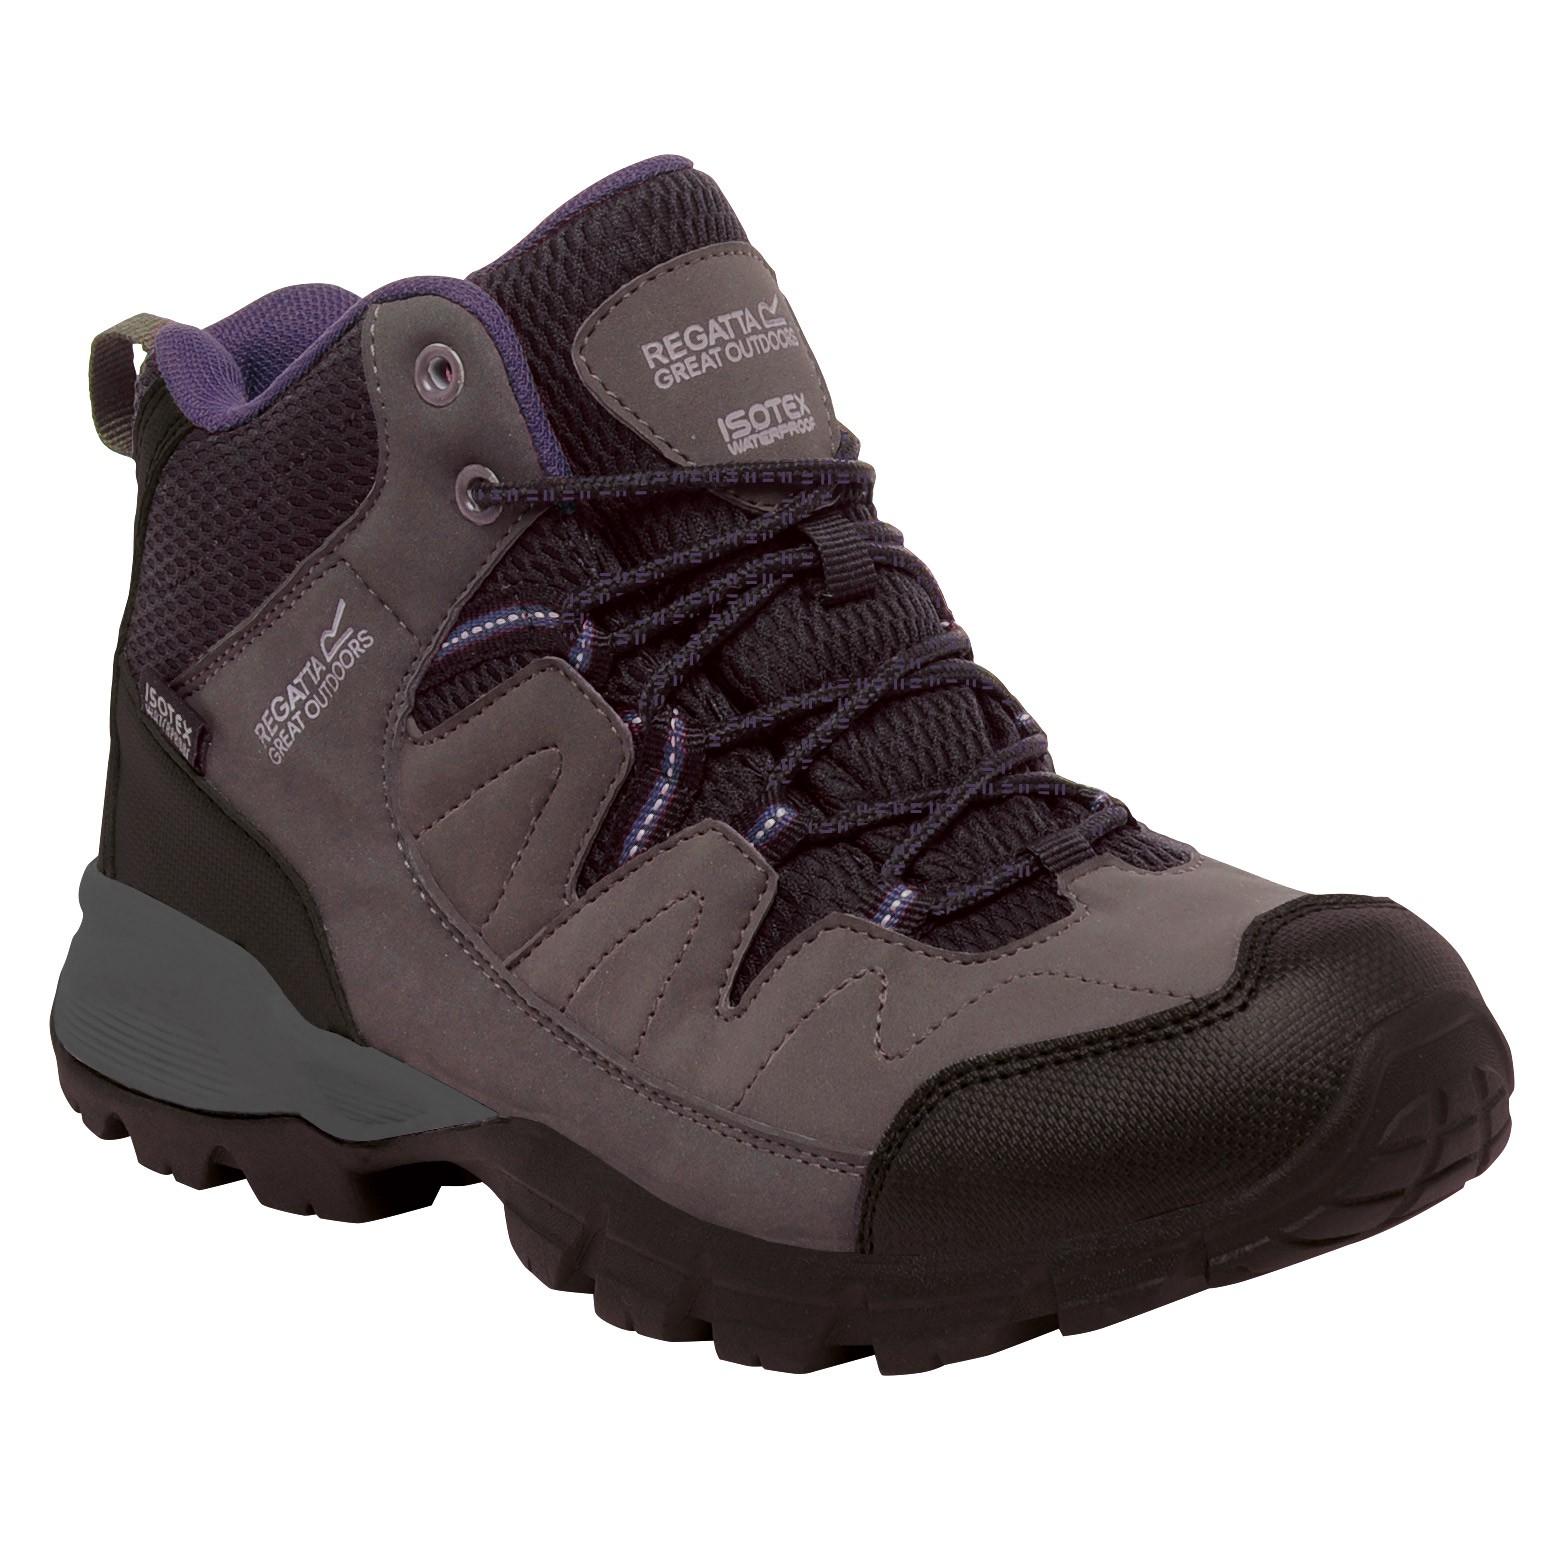 Regatta Holcombe - Chaussures montantes de randonnée - Femme (RG1008)